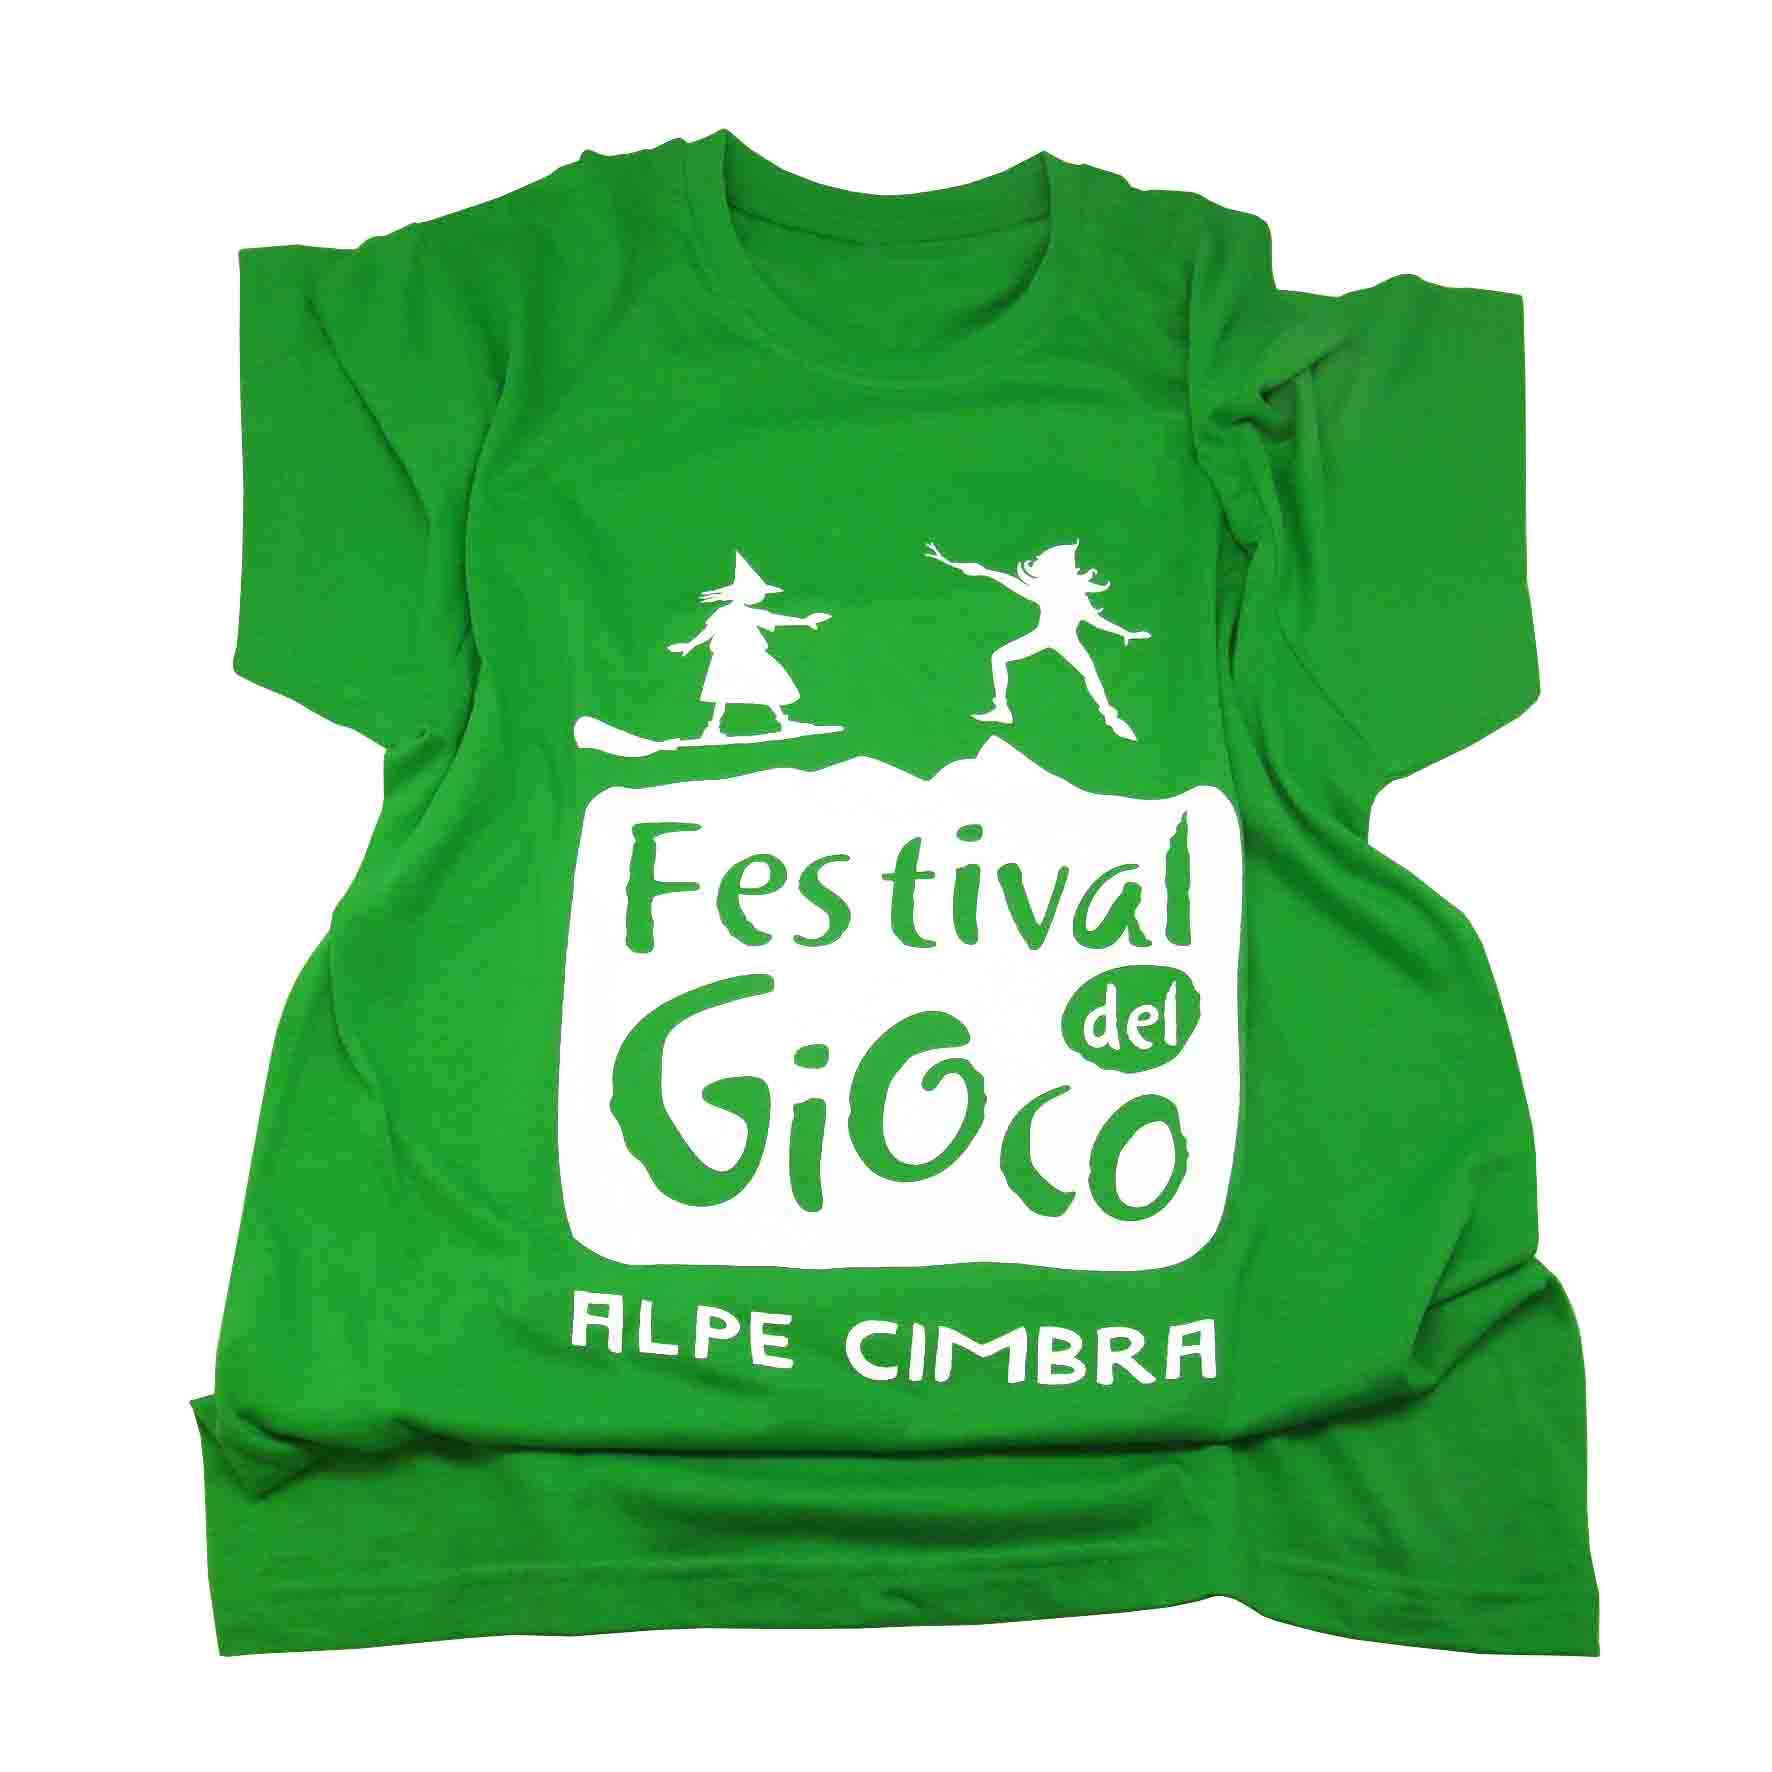 tshirt-staff-festival-gioco-alpe-cimbra